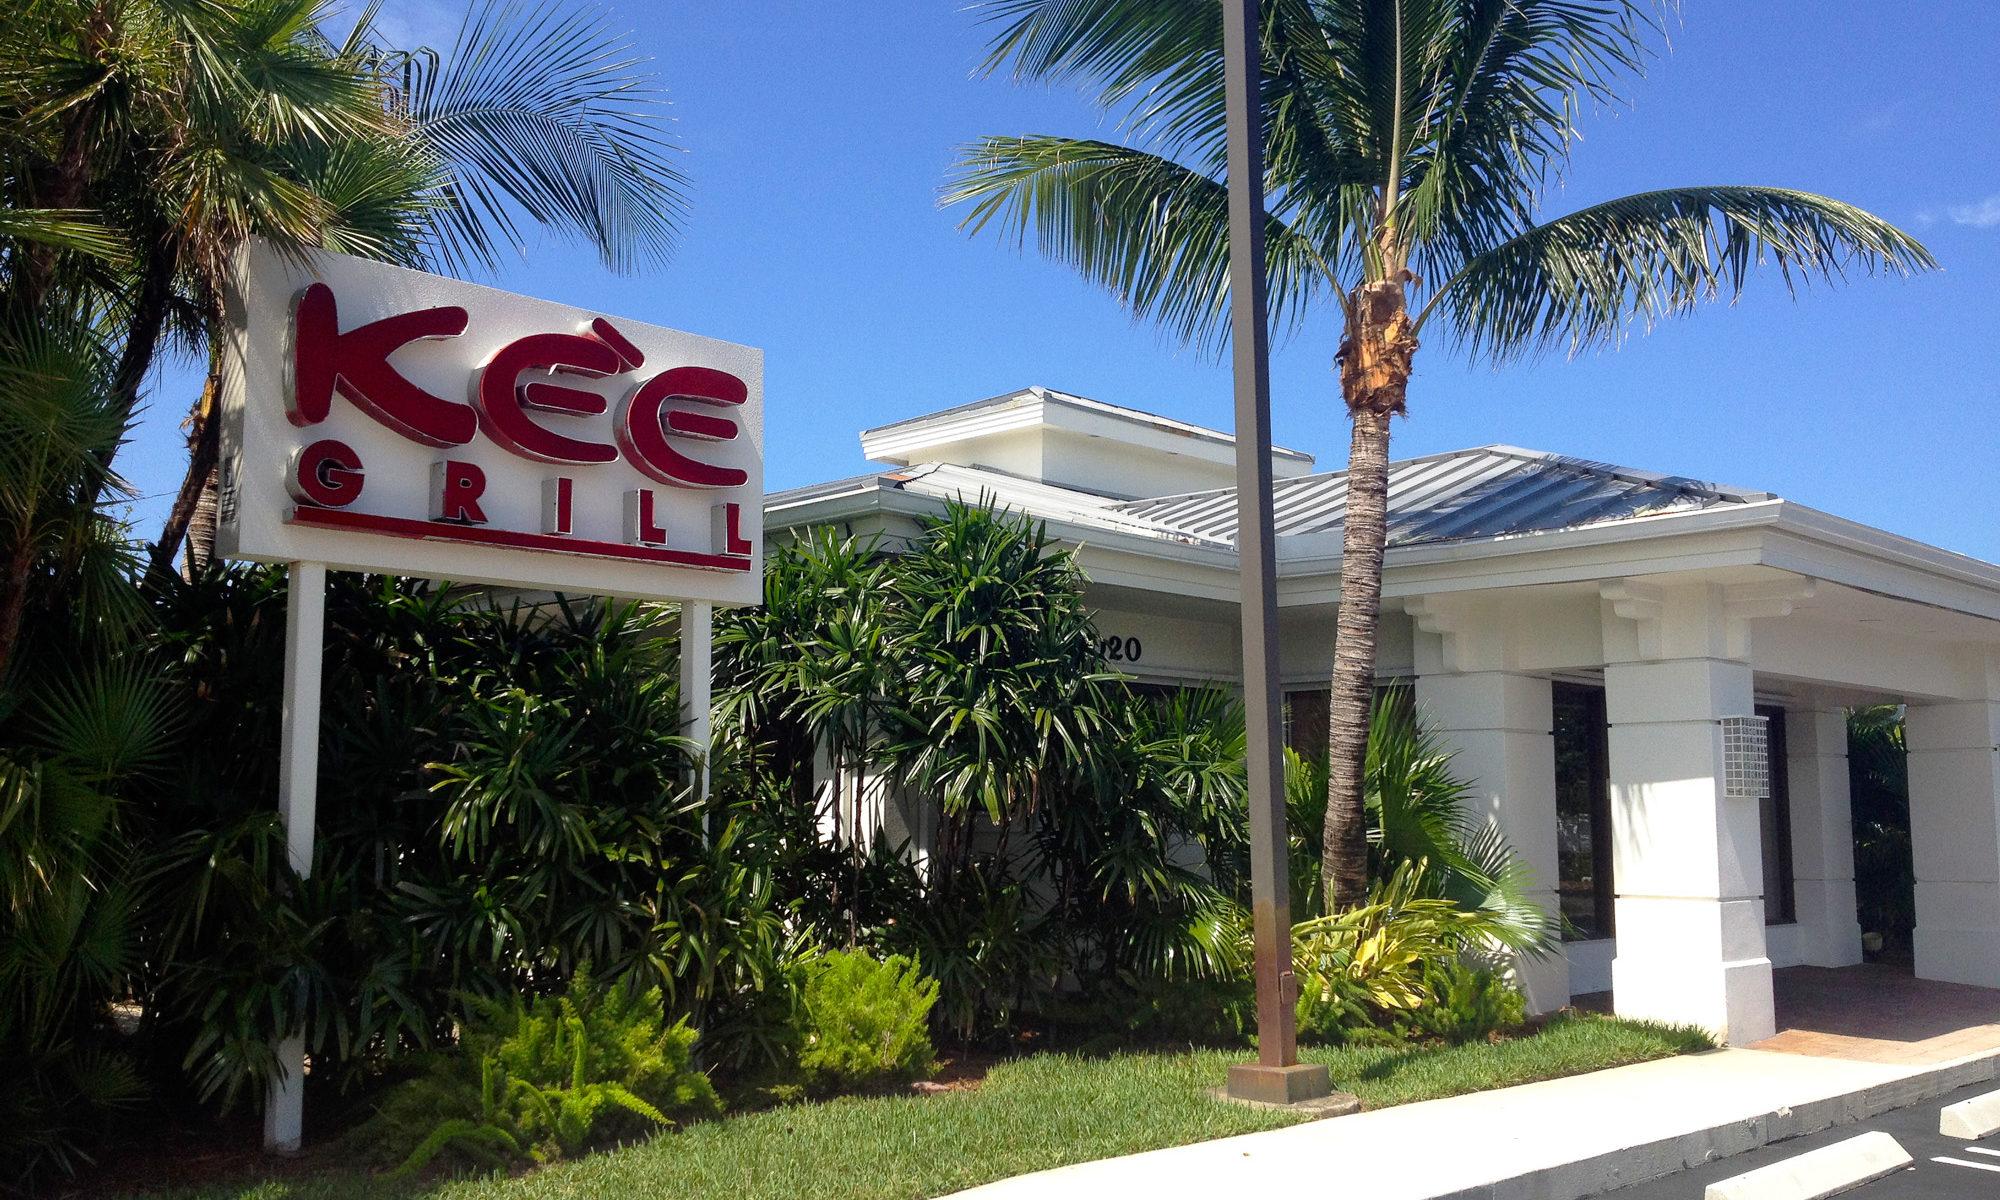 Barclay Condo Juno Beach Condos & Real Estate For Sale